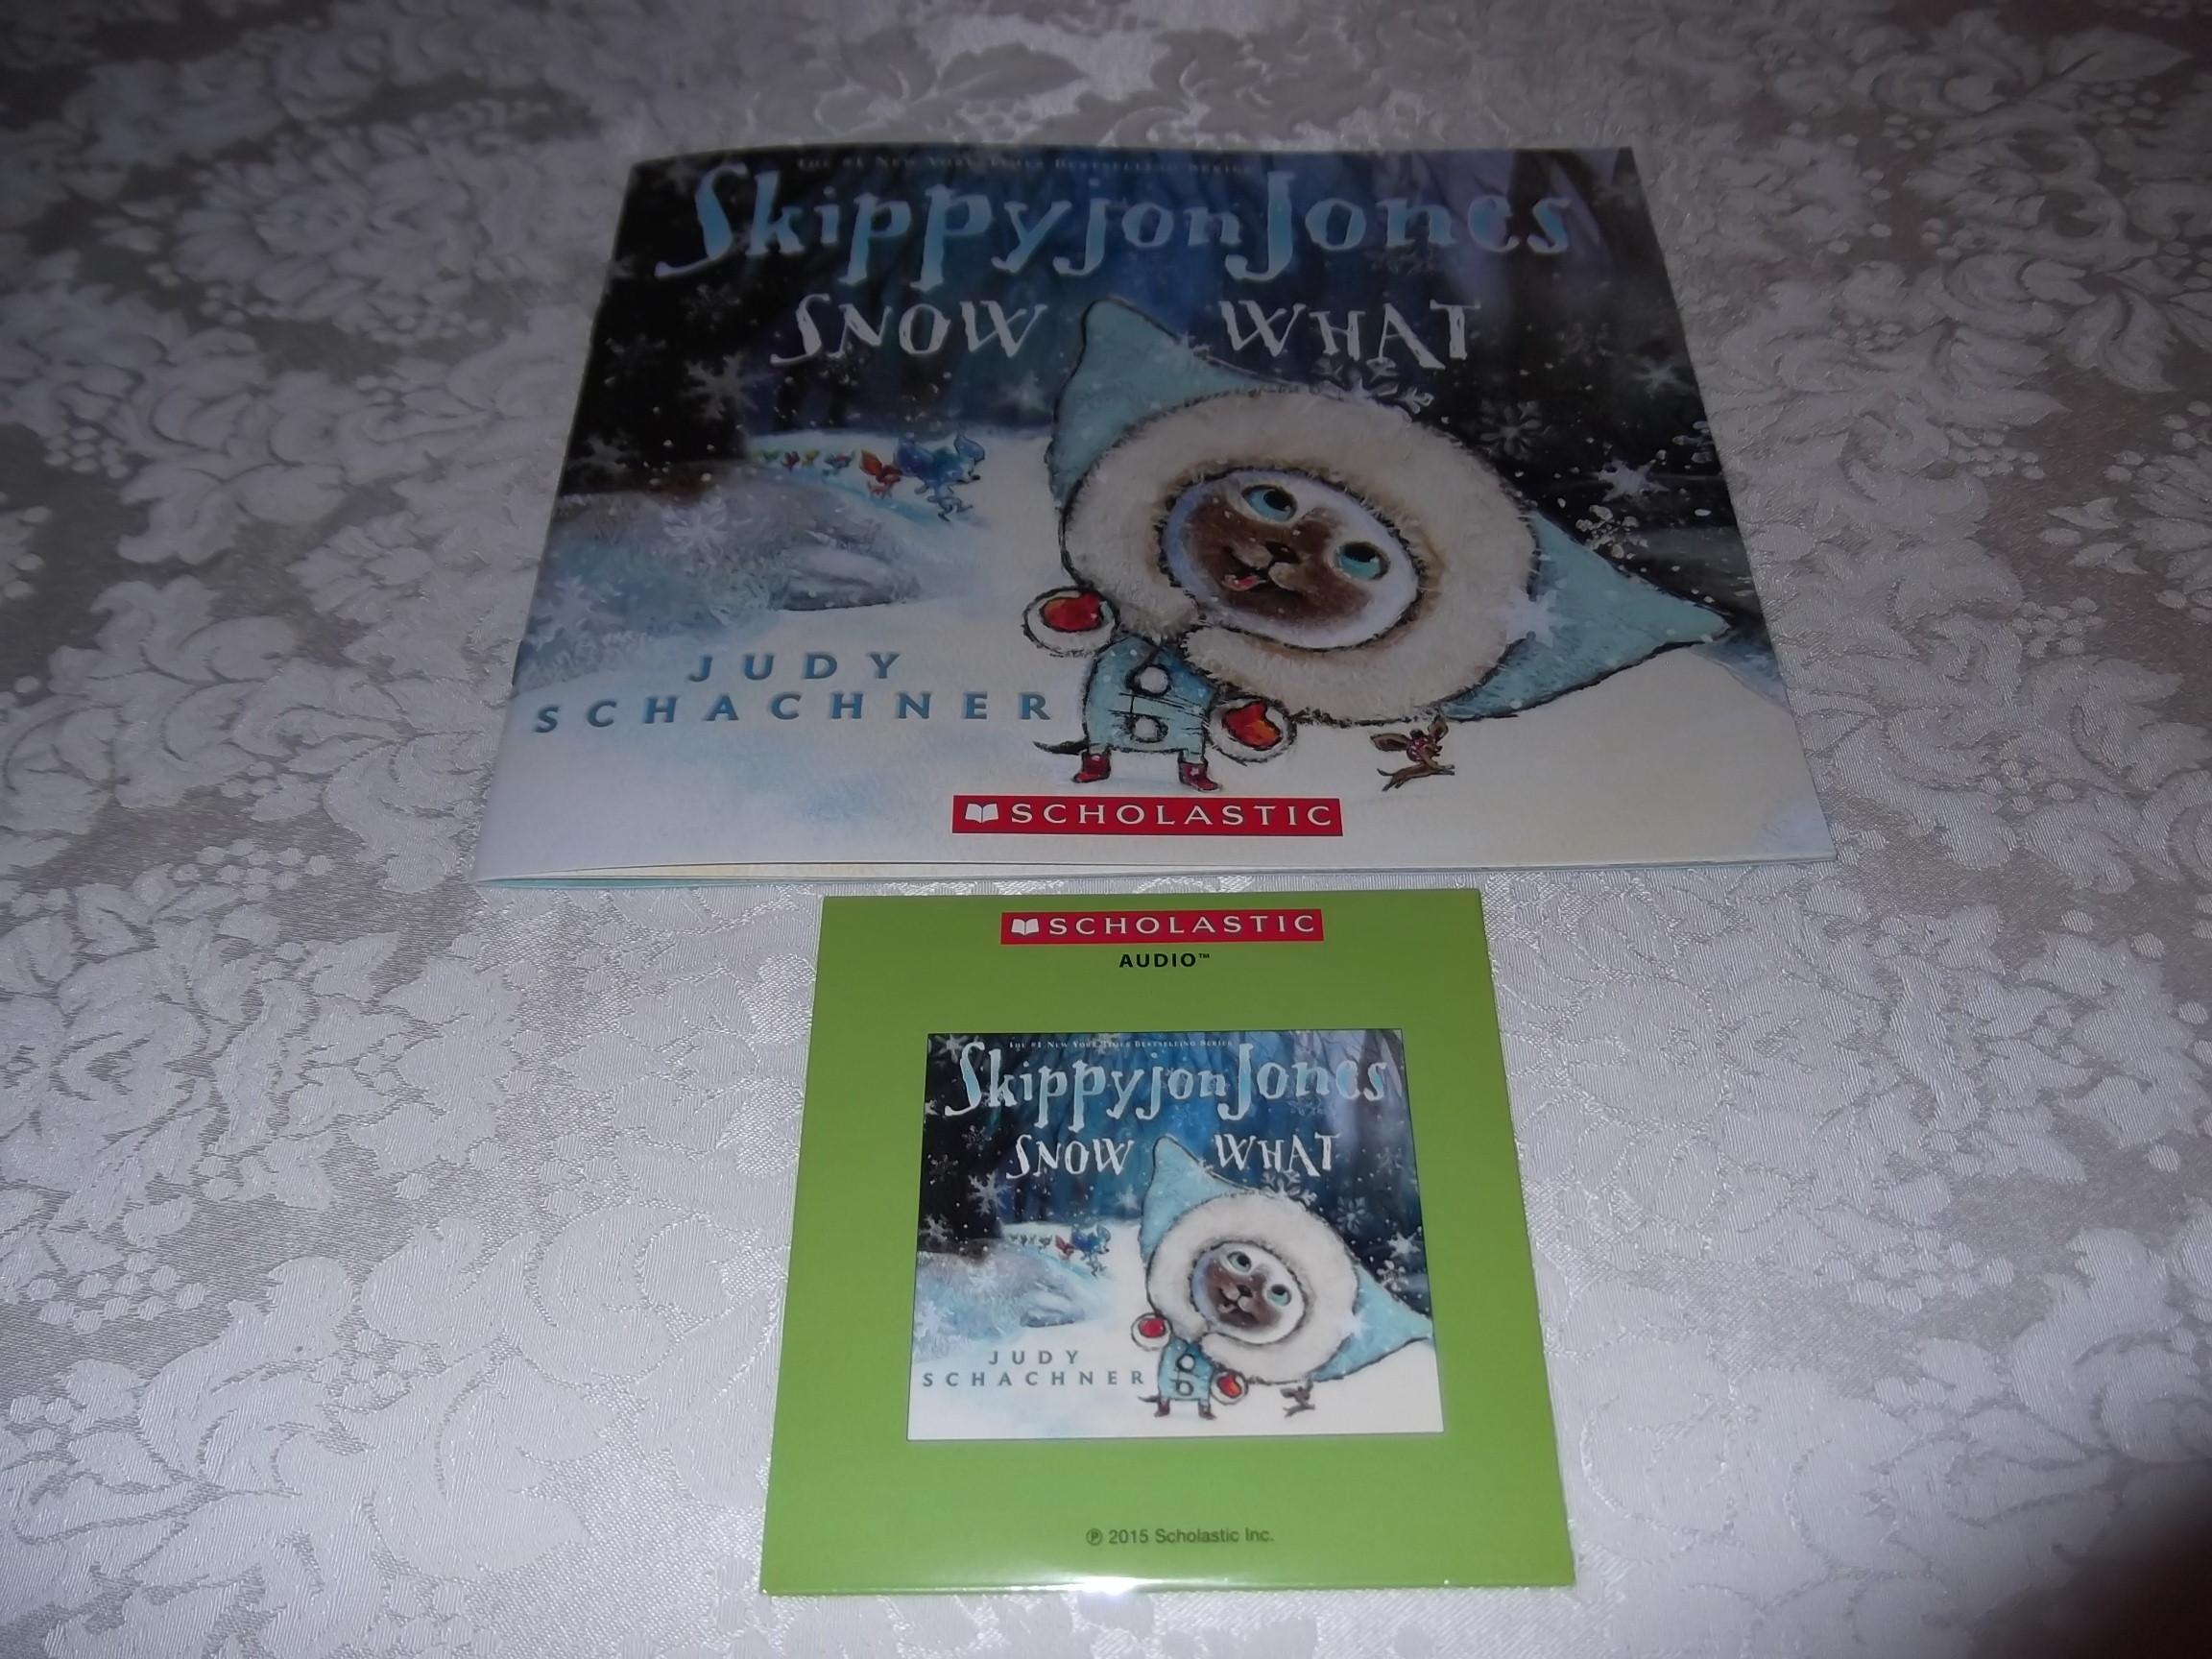 Skippyjon Jones Snow What Judy Schachner Audio CD and SC Brand New